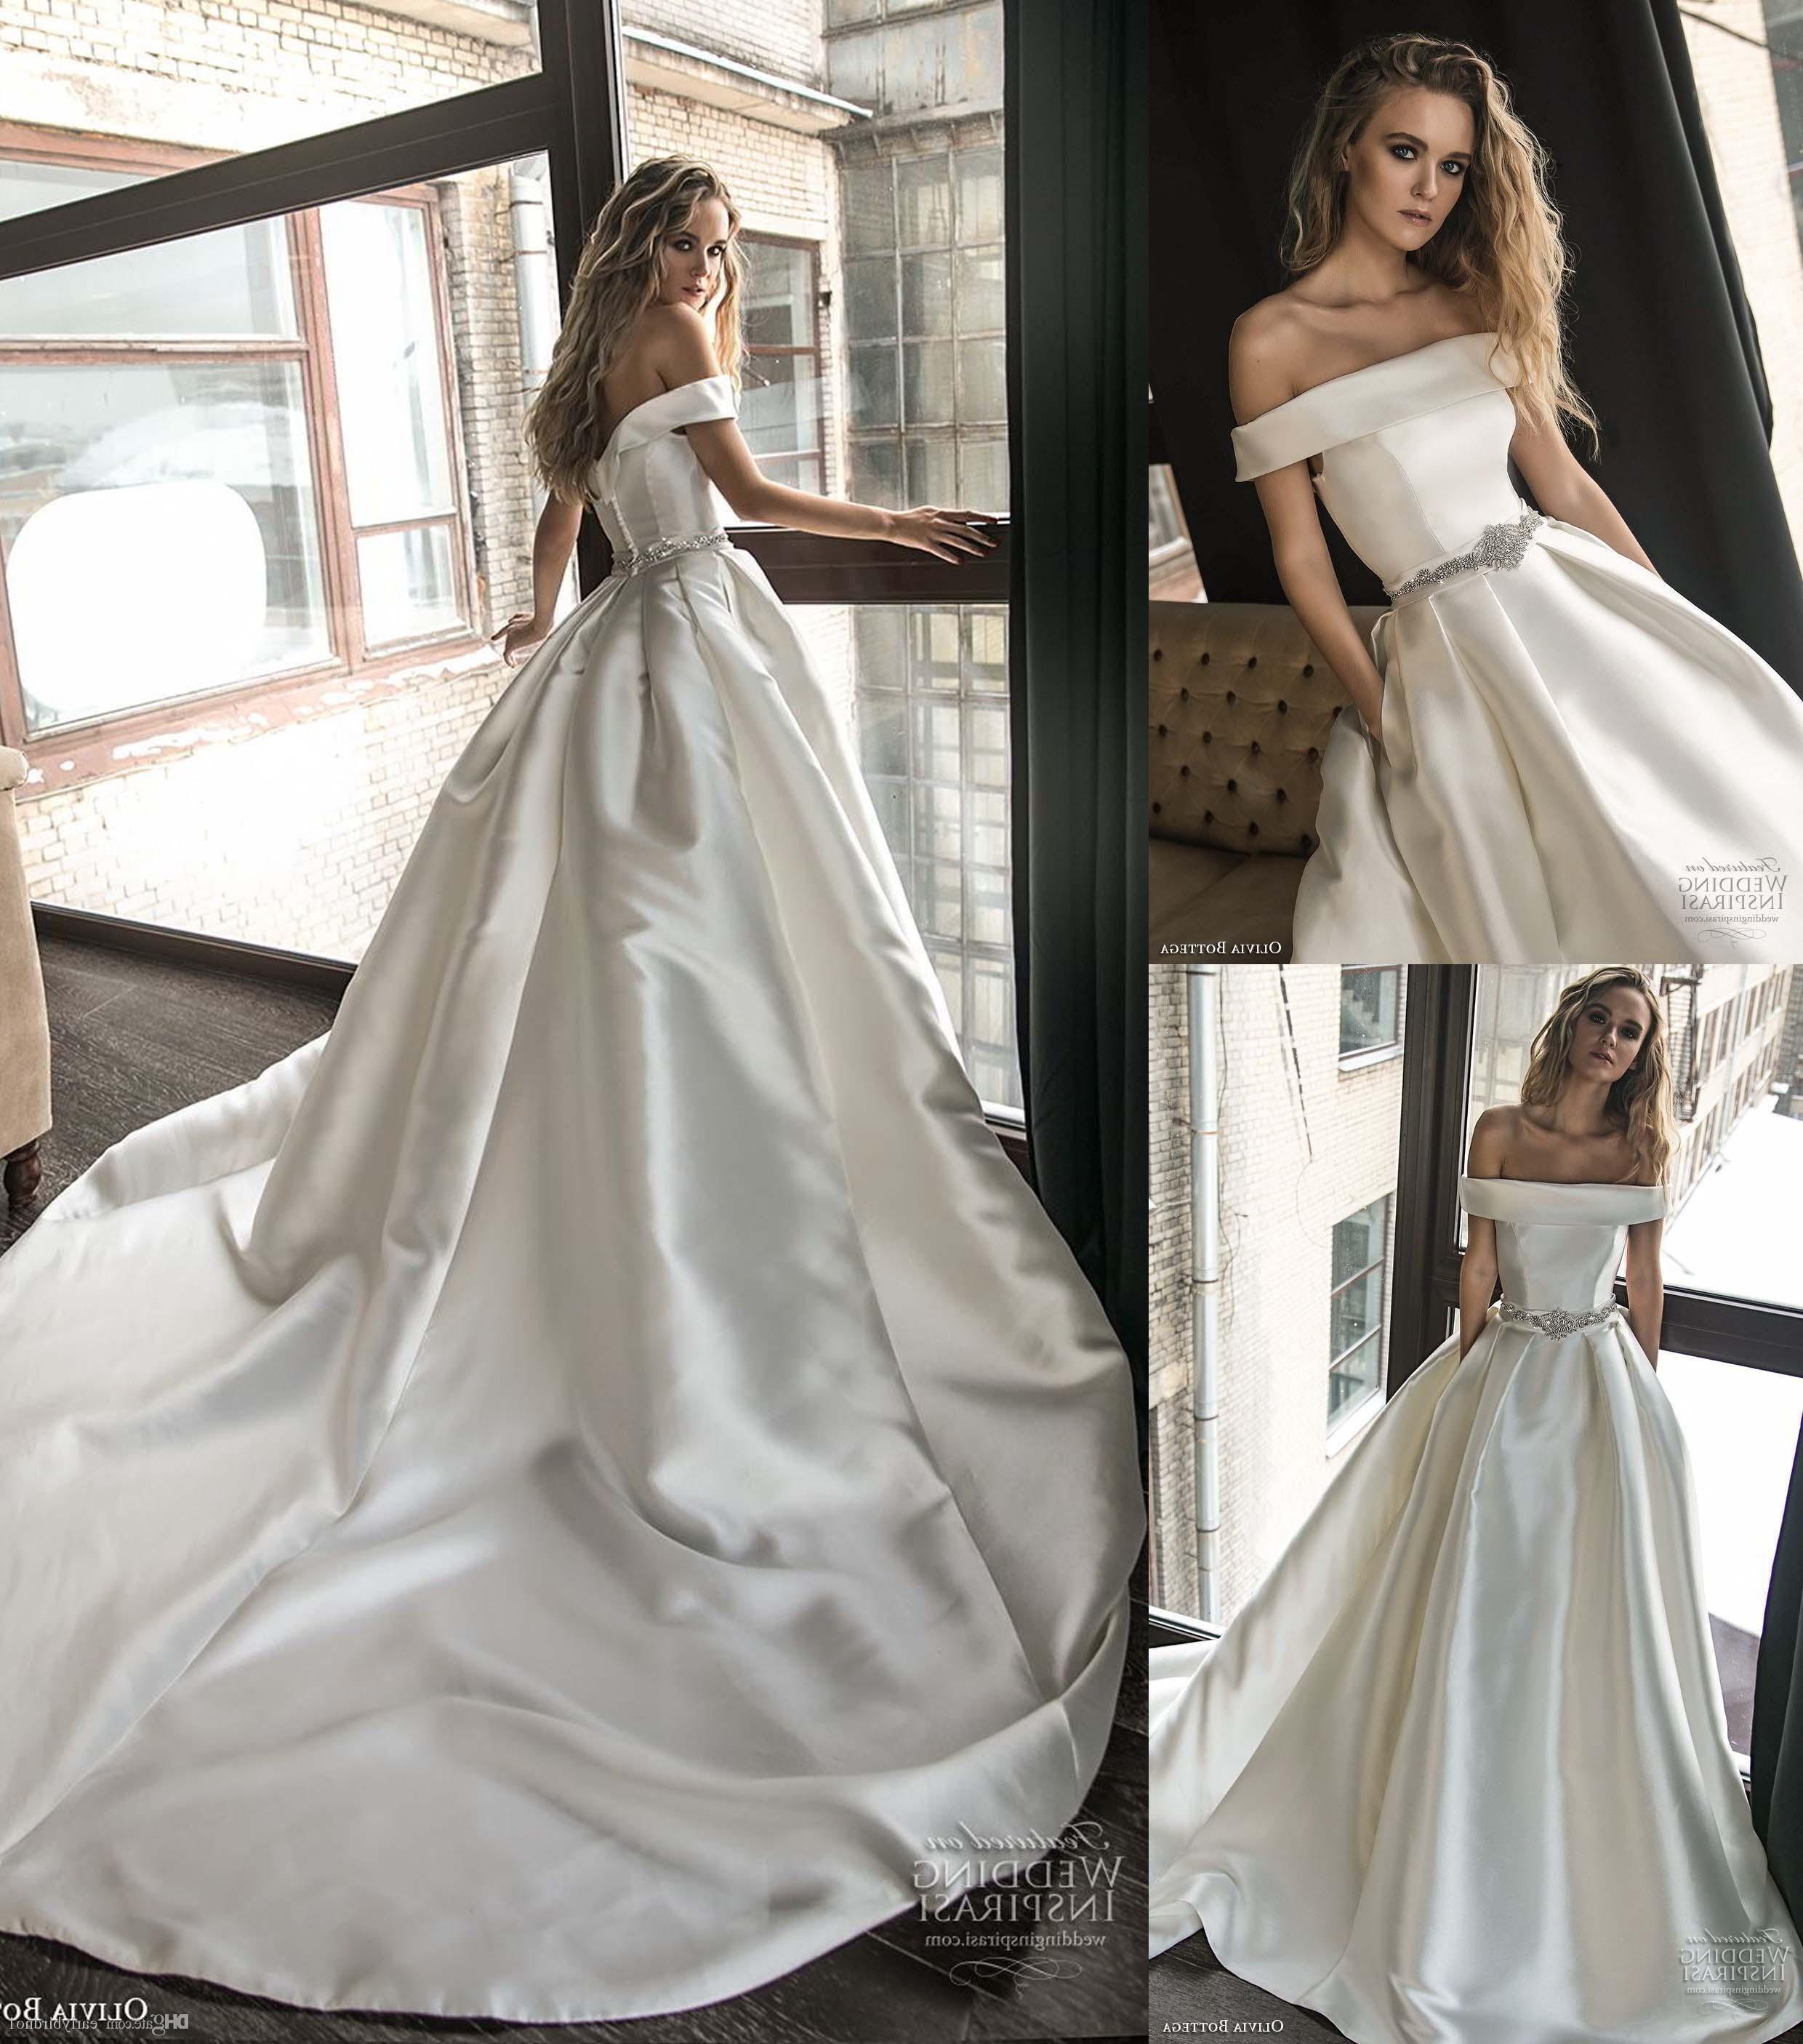 Bentuk Inspirasi Bridesmaid Hijab 9fdy Wedding Ideas Colorful Wedding Dresses Enticing Wedding